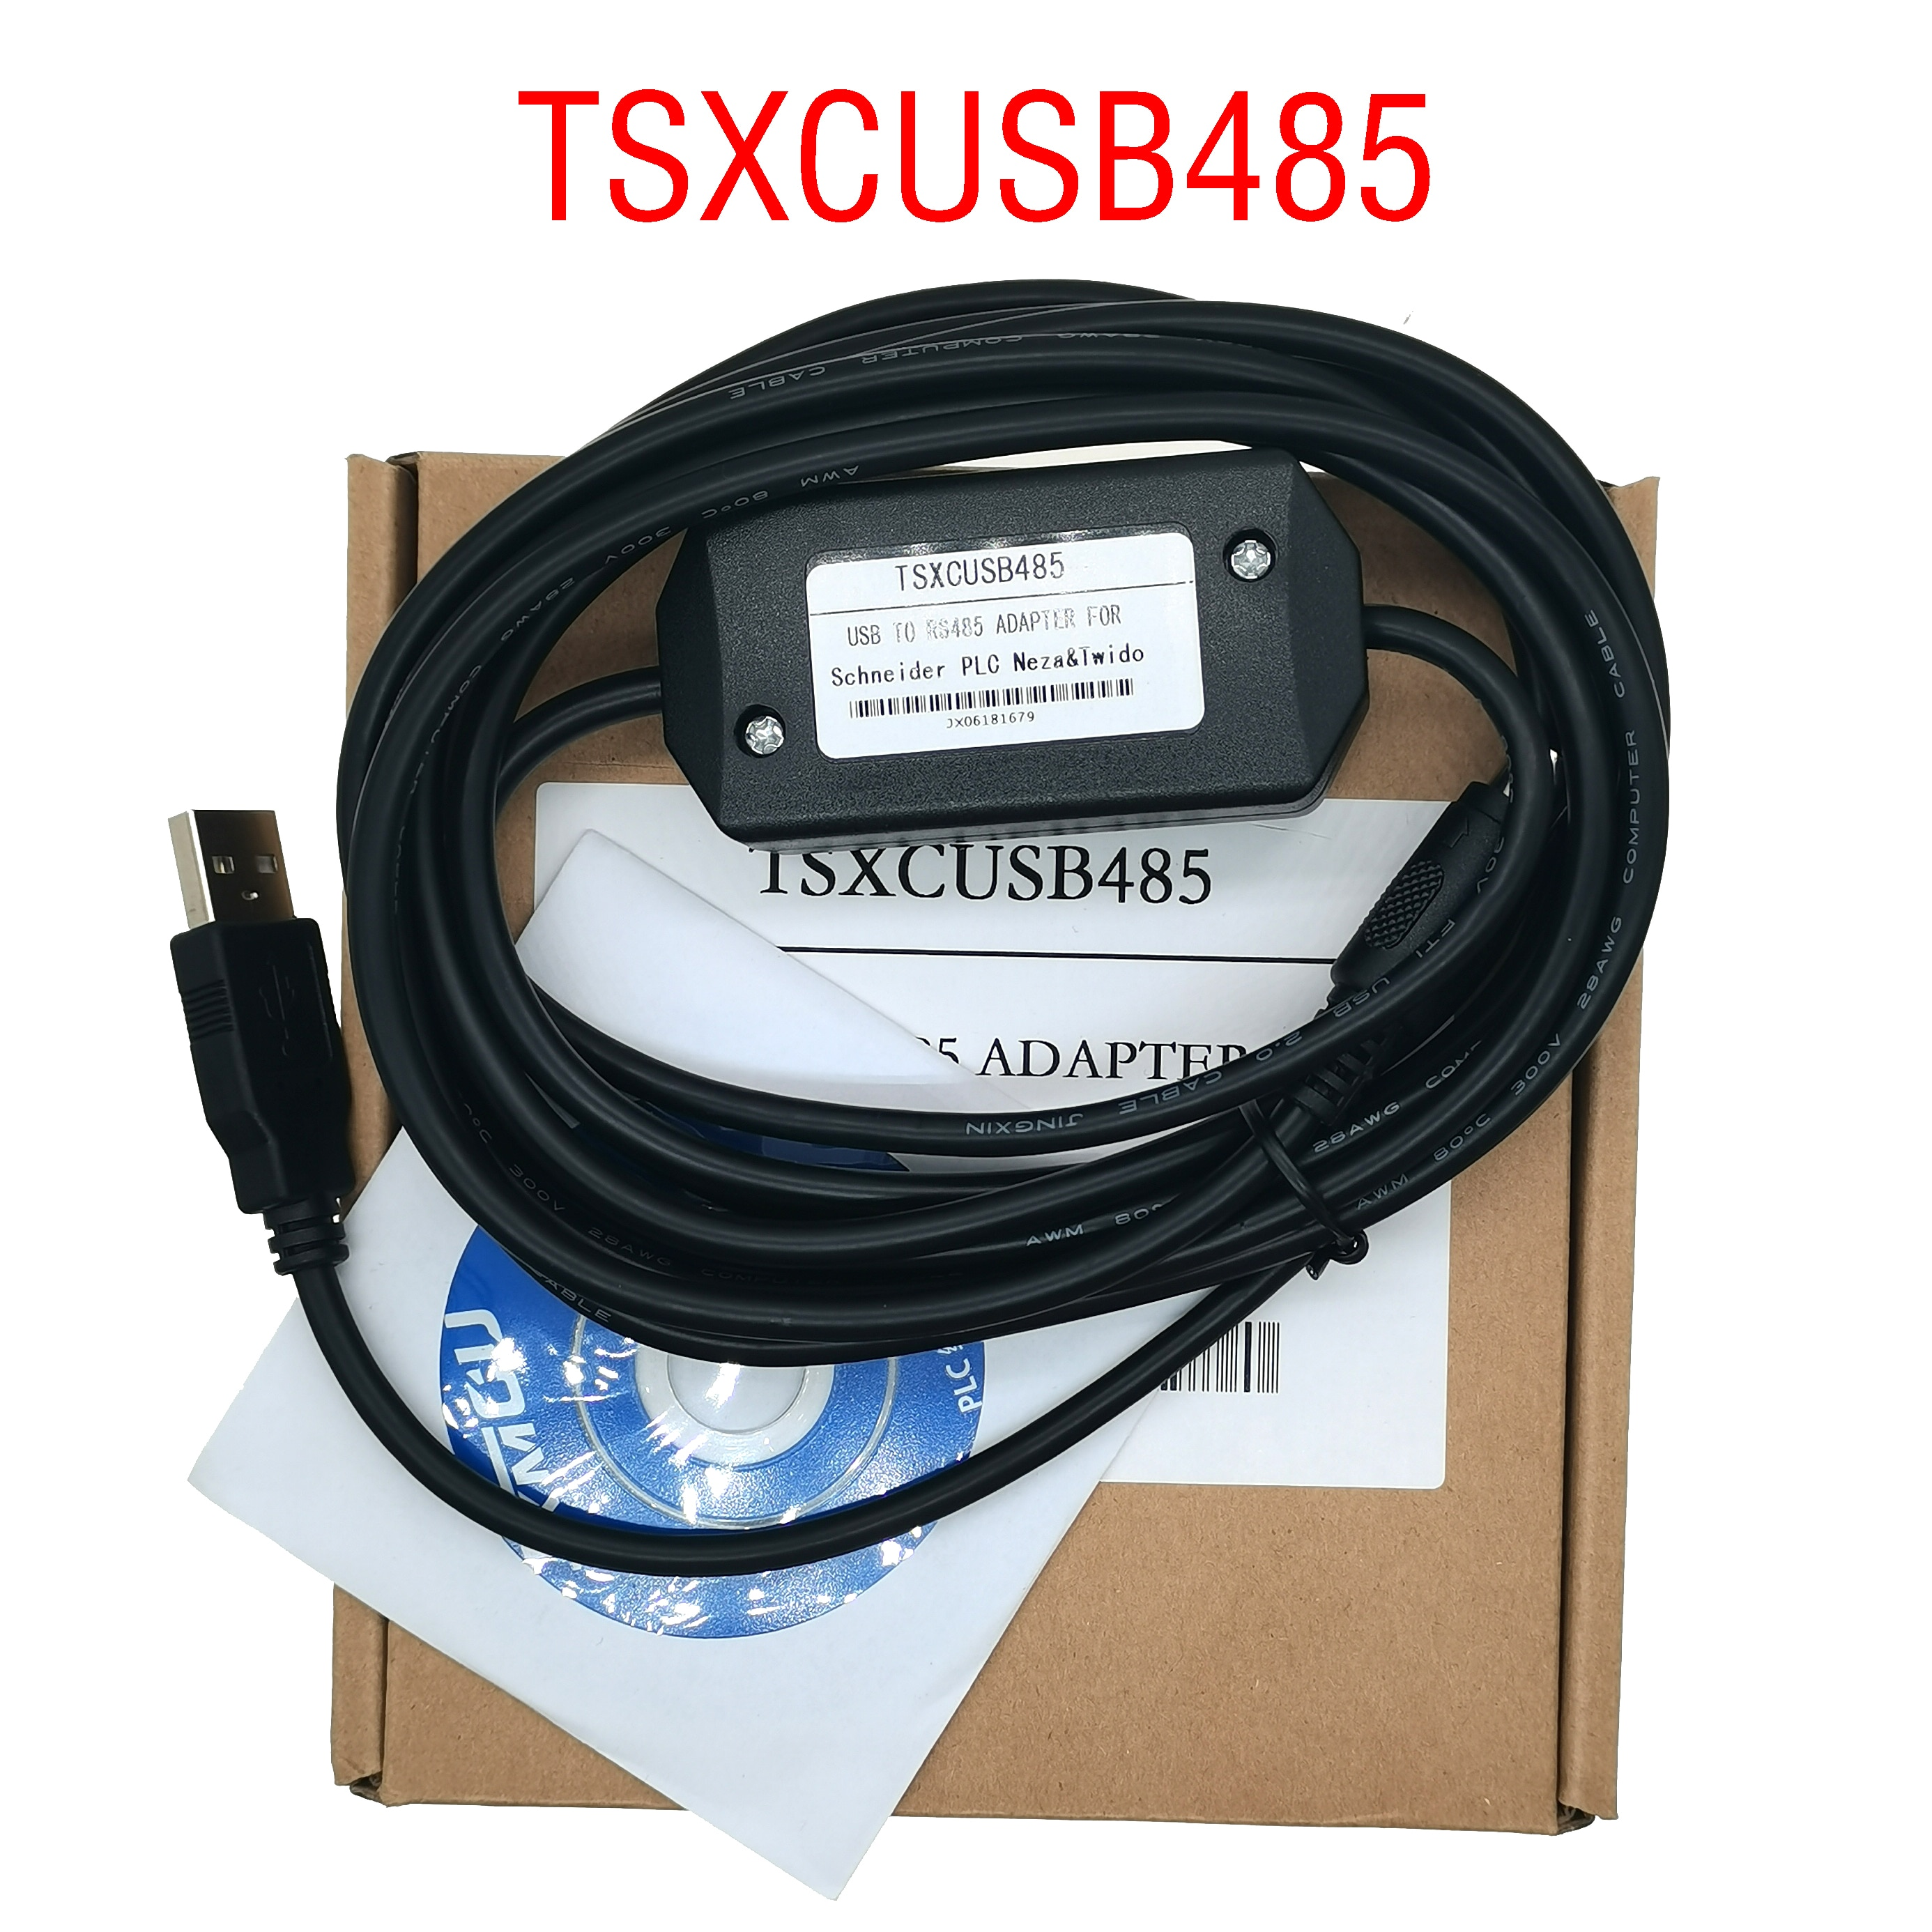 TSXCUSB485 tsxcrjmd25, Tsxpcx3030 Usb/rs485 محول متعدد الوظائف Plc Para Premium ، Micro ، Nano